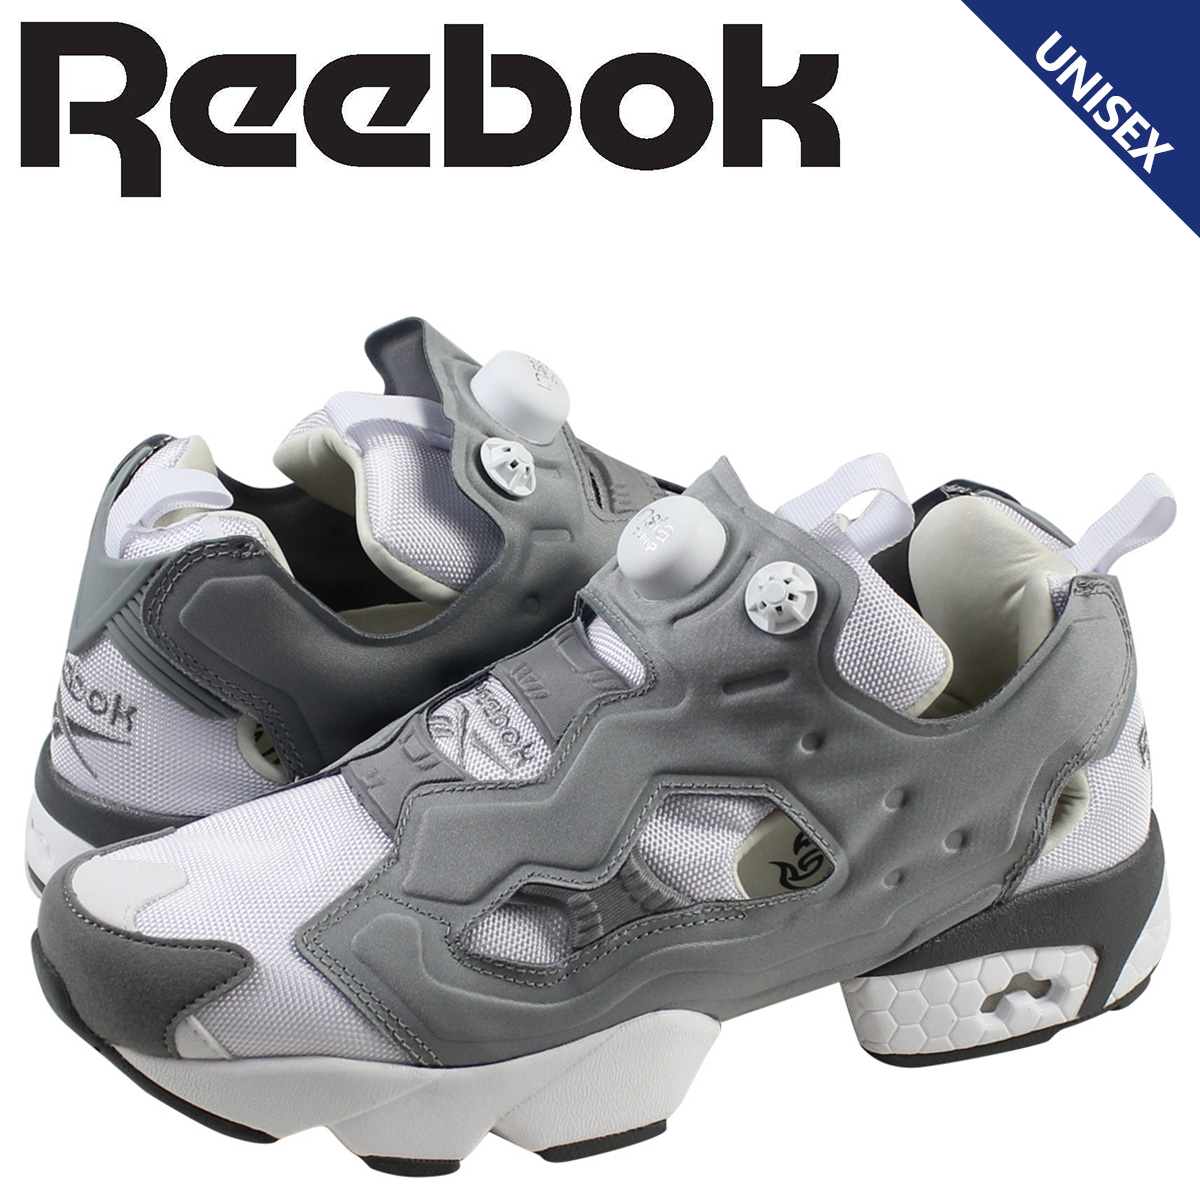 9667607692ce Whats up Sports  Reebok Reebok pump fury sneakers INSTA PUMP FURY OG ...